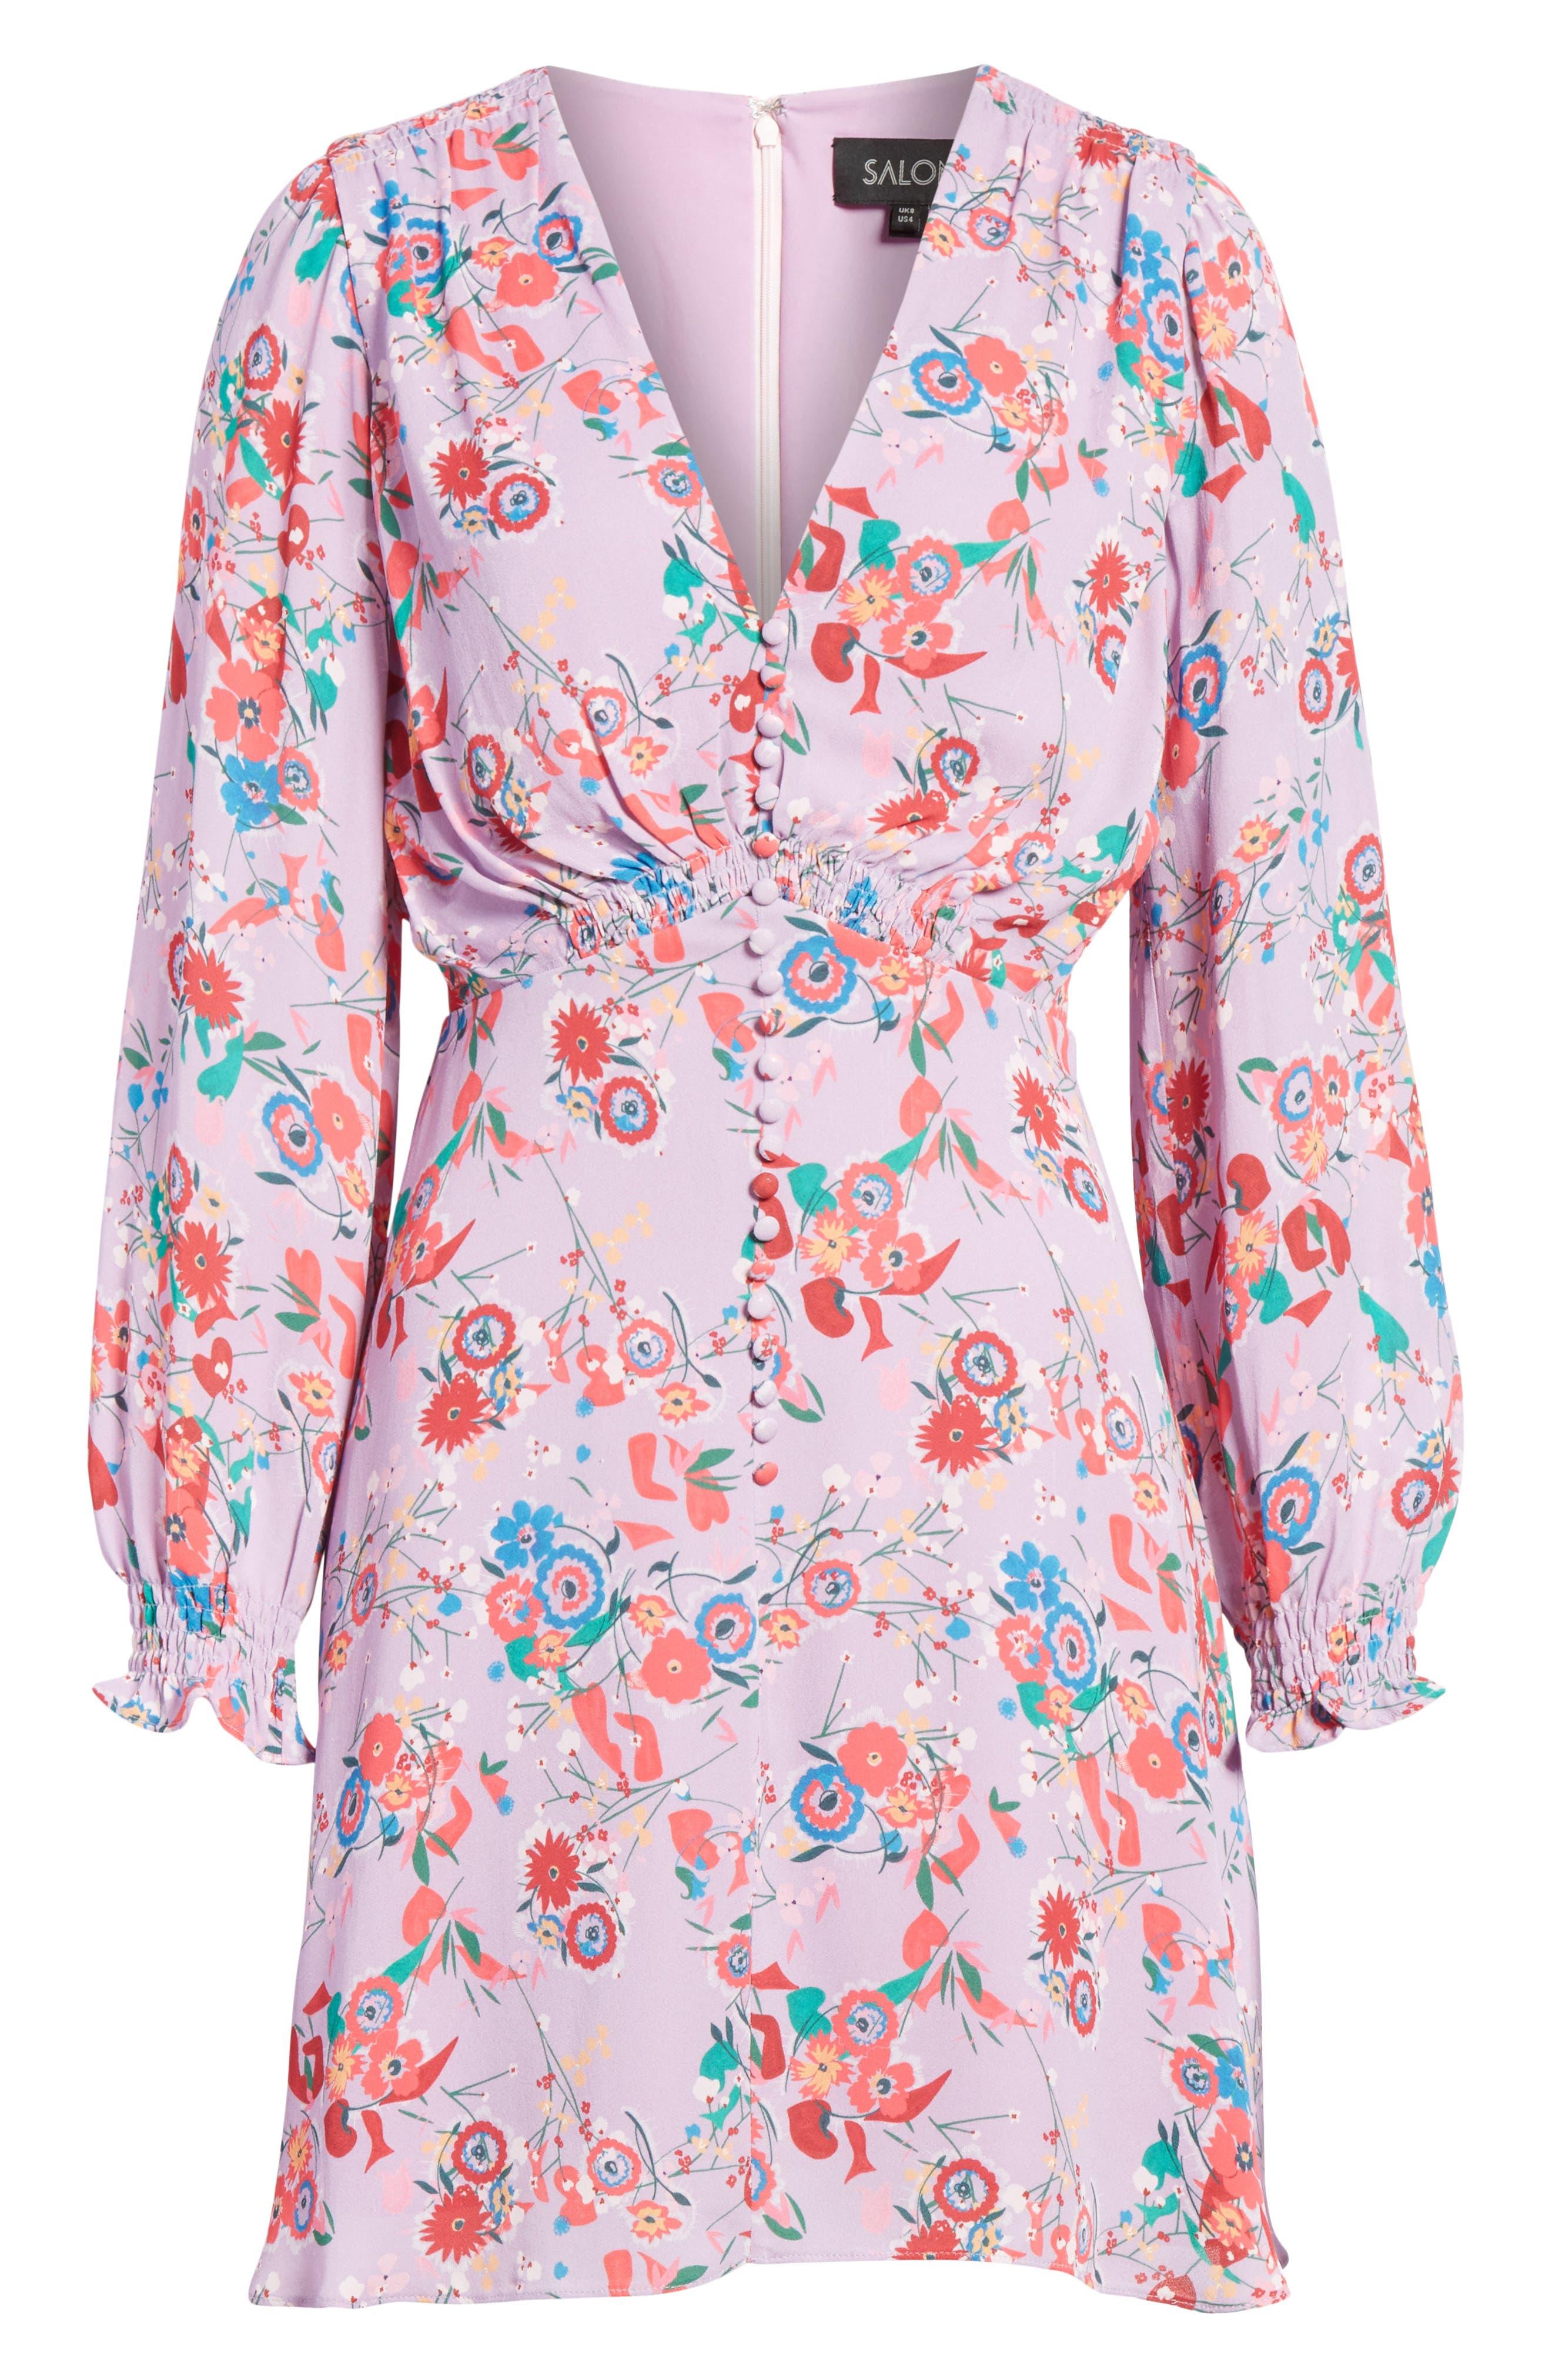 Eve Floral Print Dress,                             Alternate thumbnail 6, color,                             Lilac Pimpernel